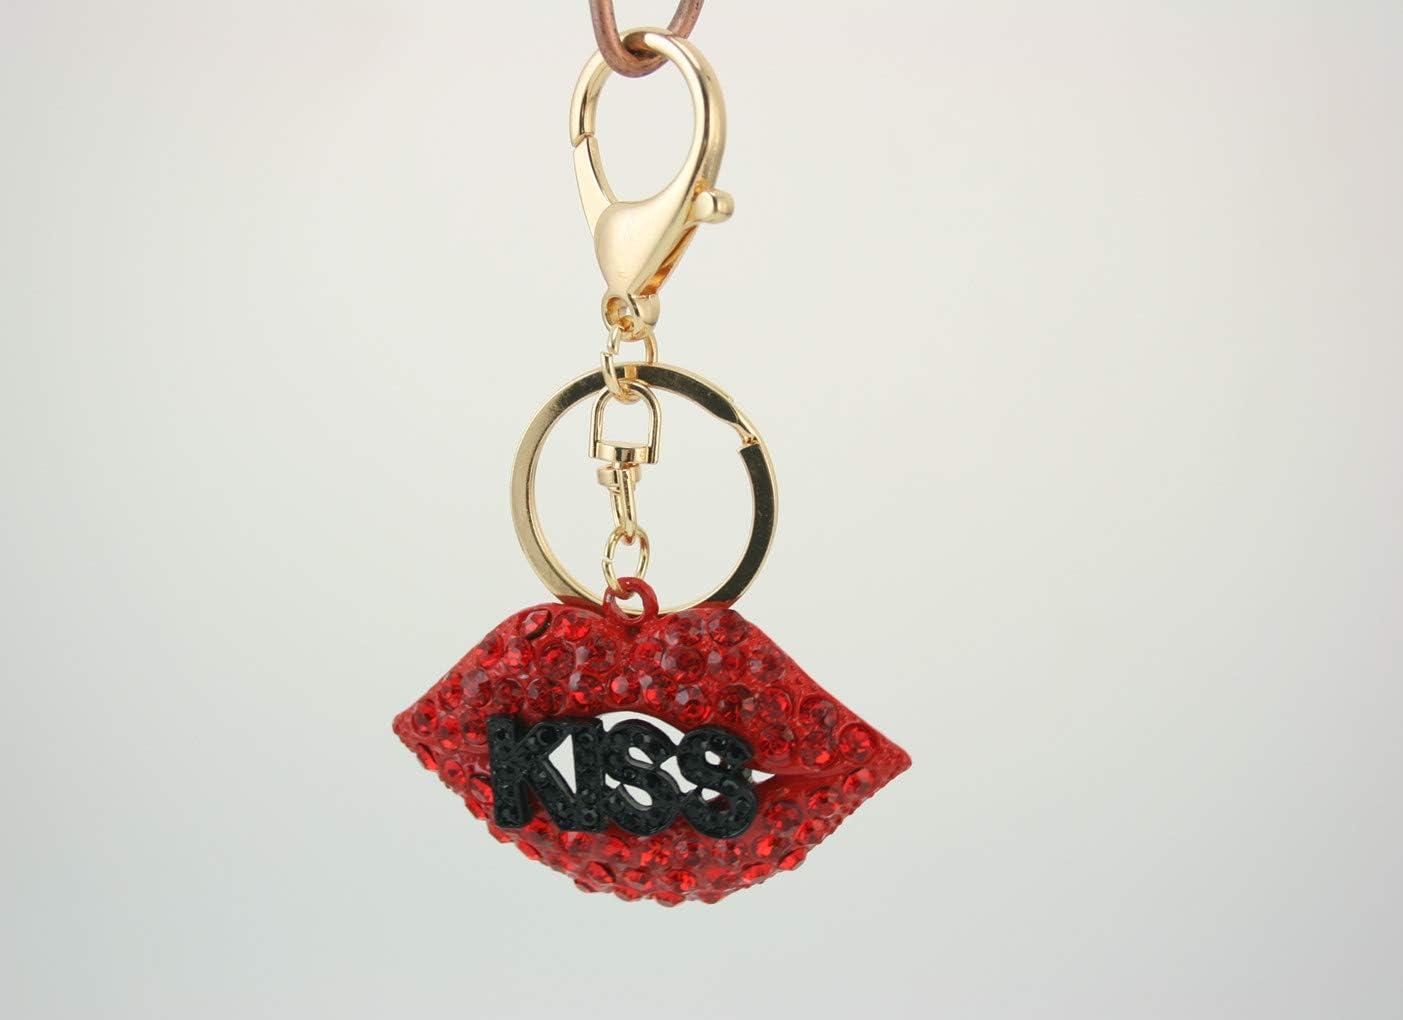 WELSH DRAGON Keyring Handbag Charm Sparkle Rhinestone Key-Ring AUTHENTIC NEW